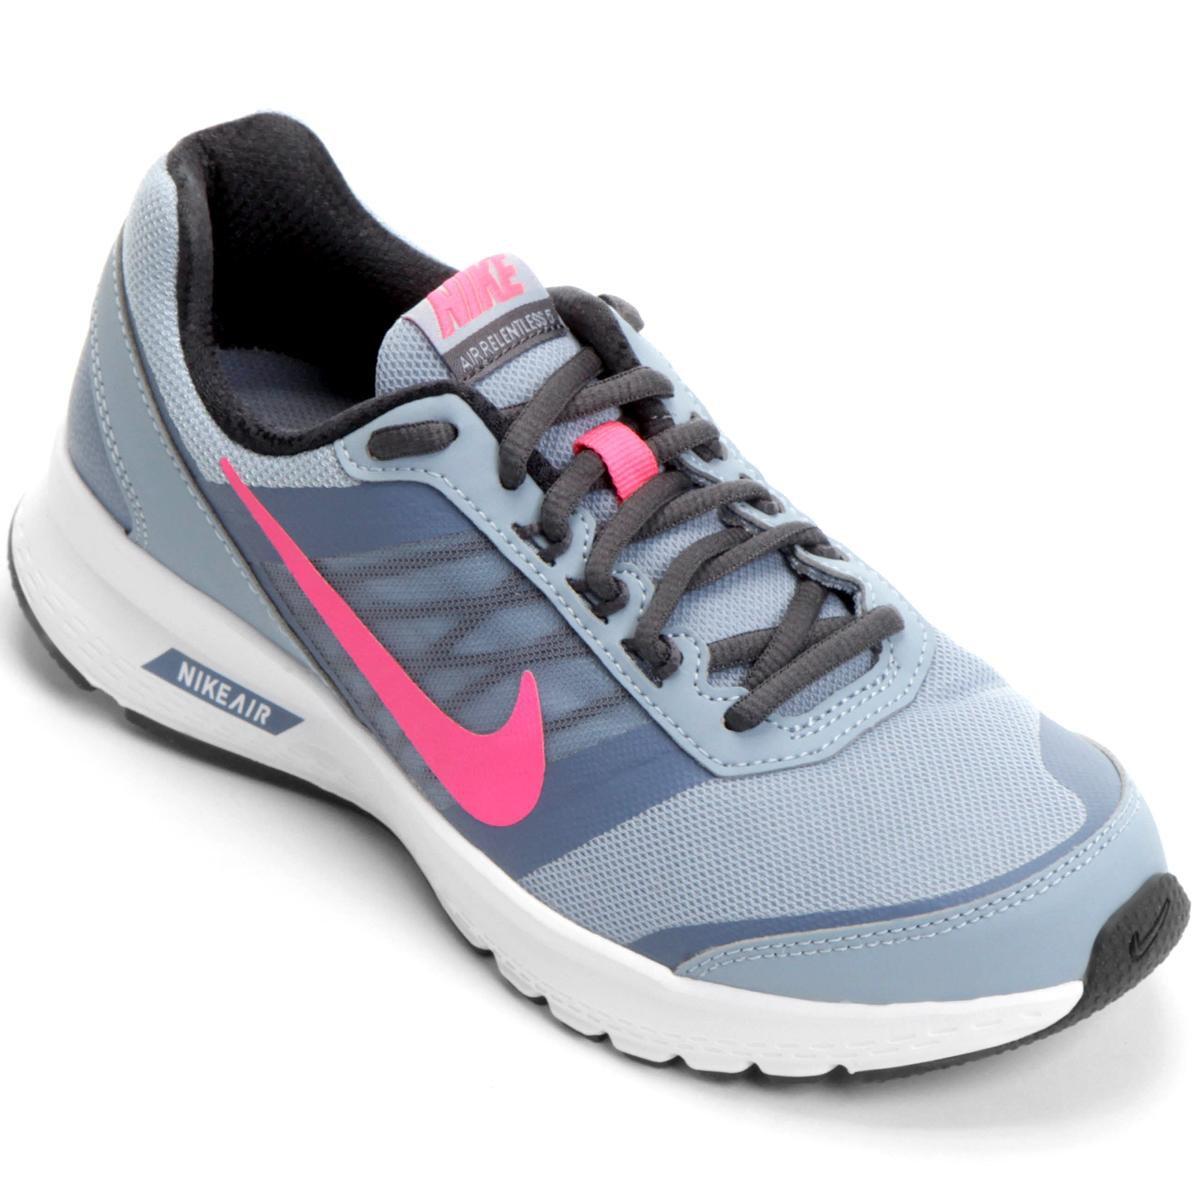 22dd24a9afc Tênis Nike Air Relentless 5 MSL Feminino - Compre Agora